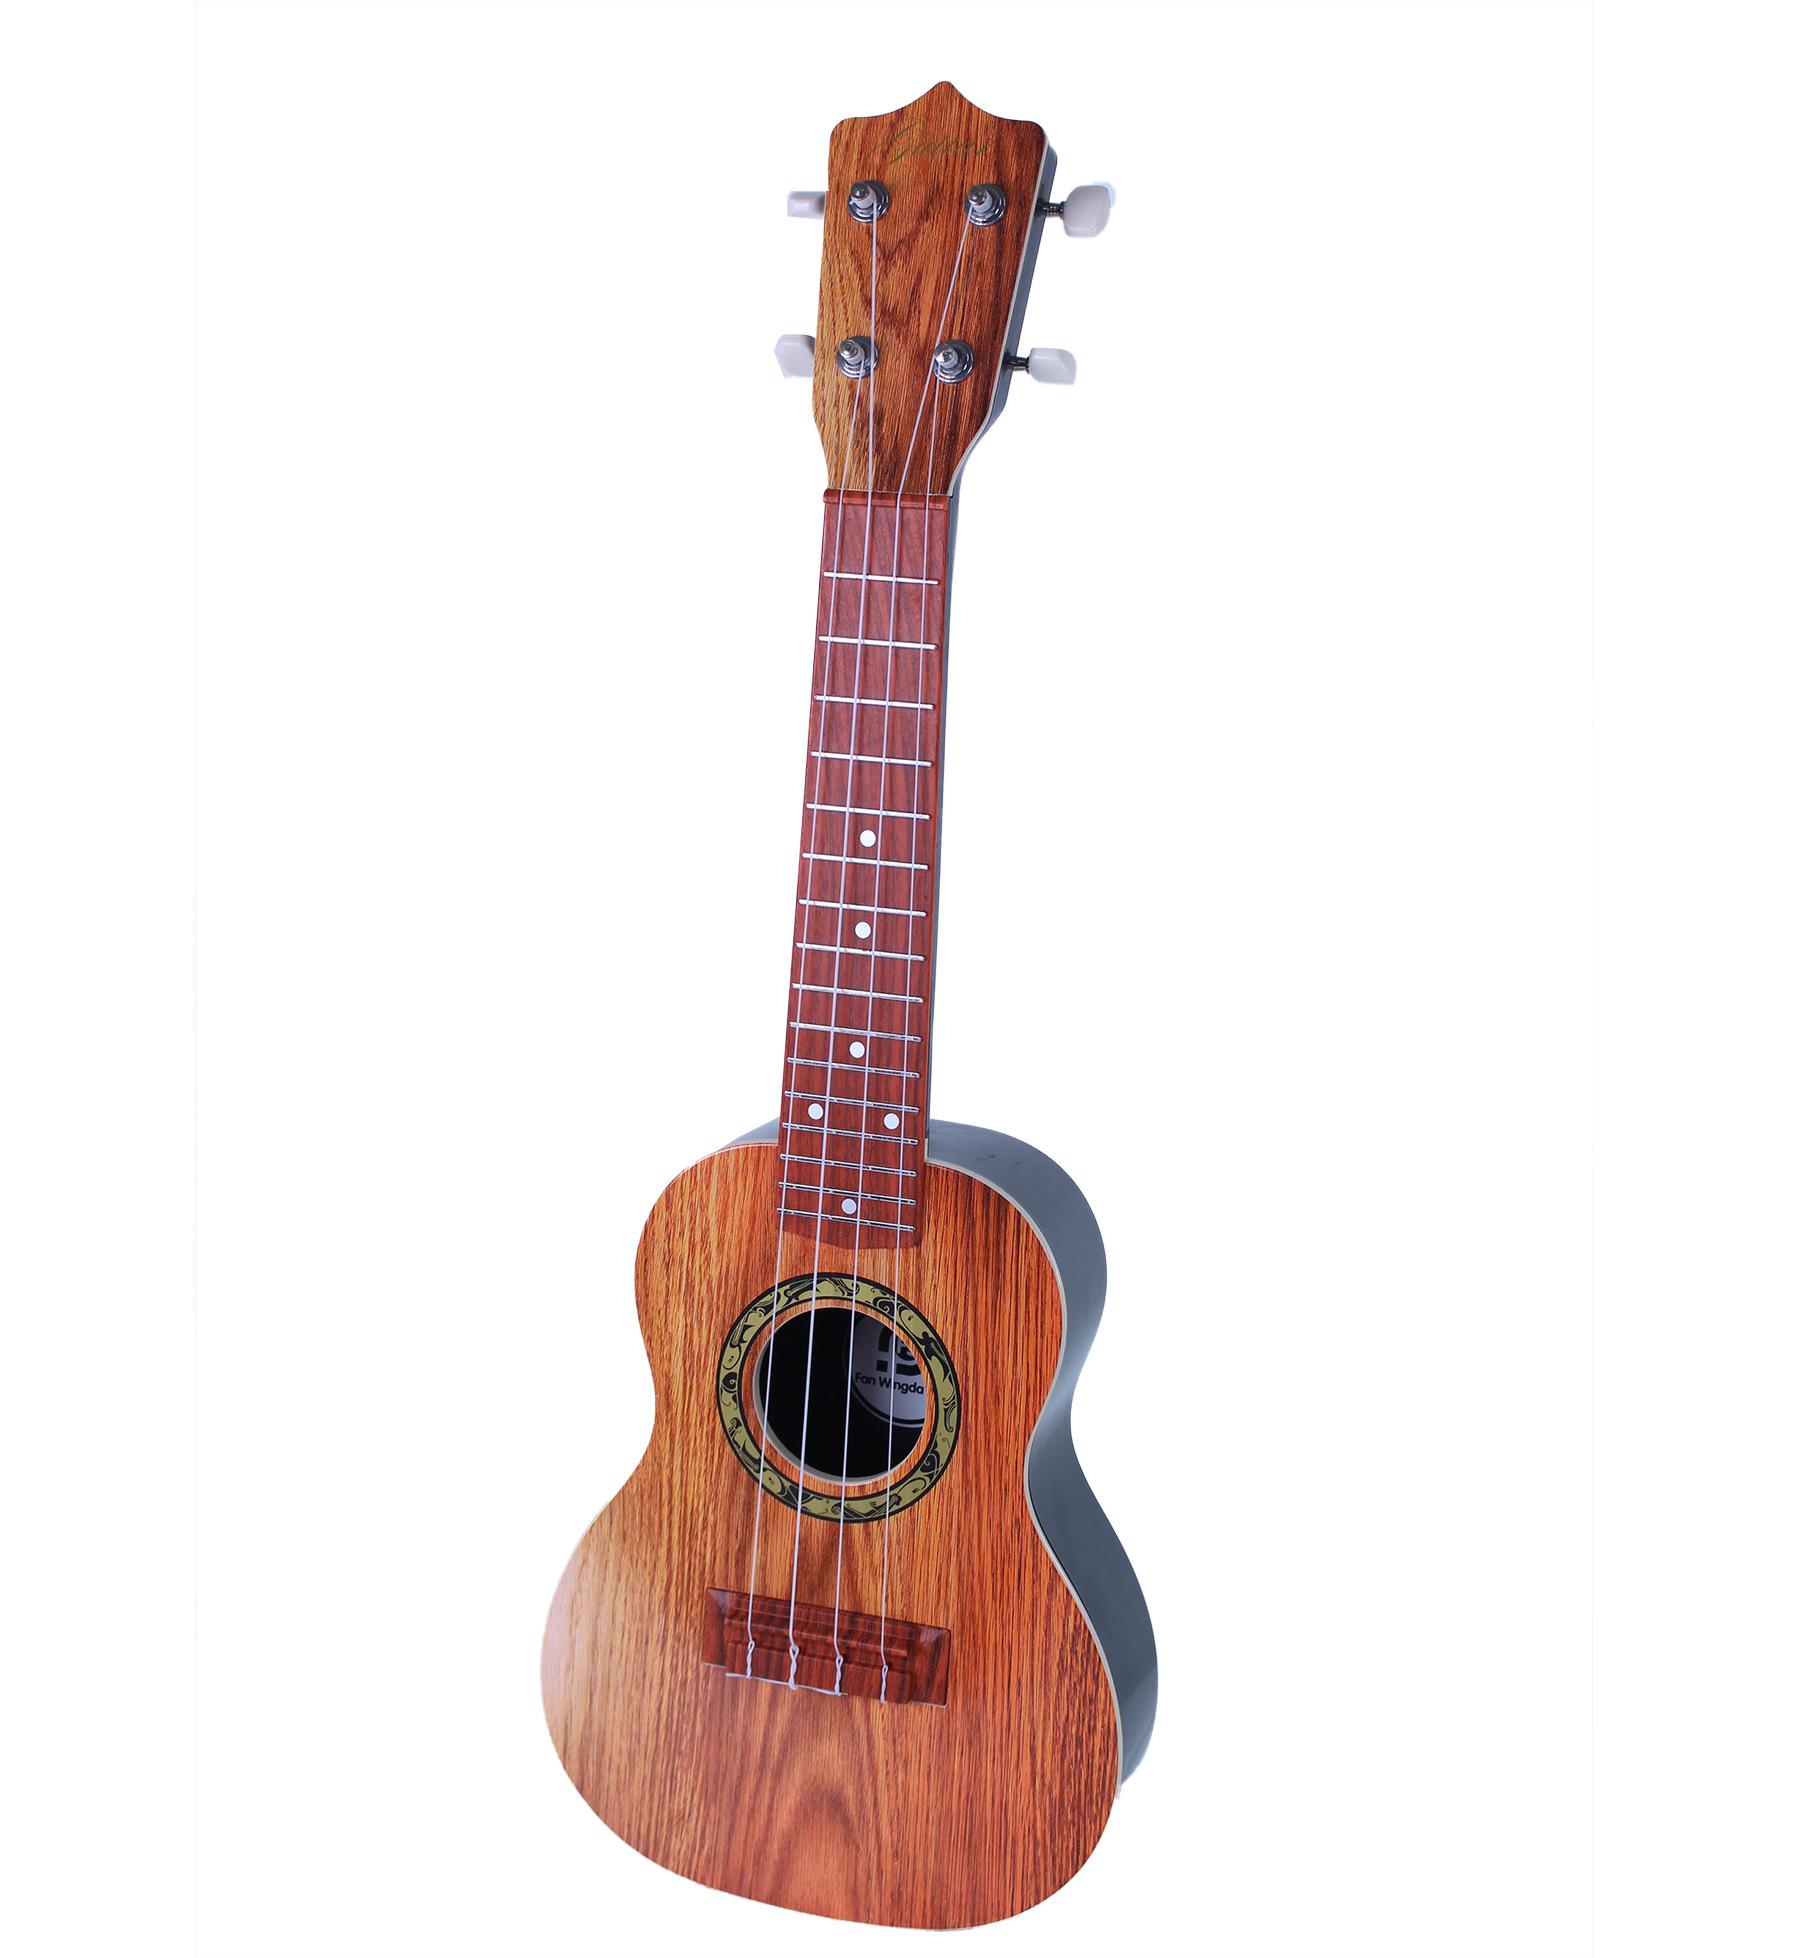 Dětská kytara 58 cm